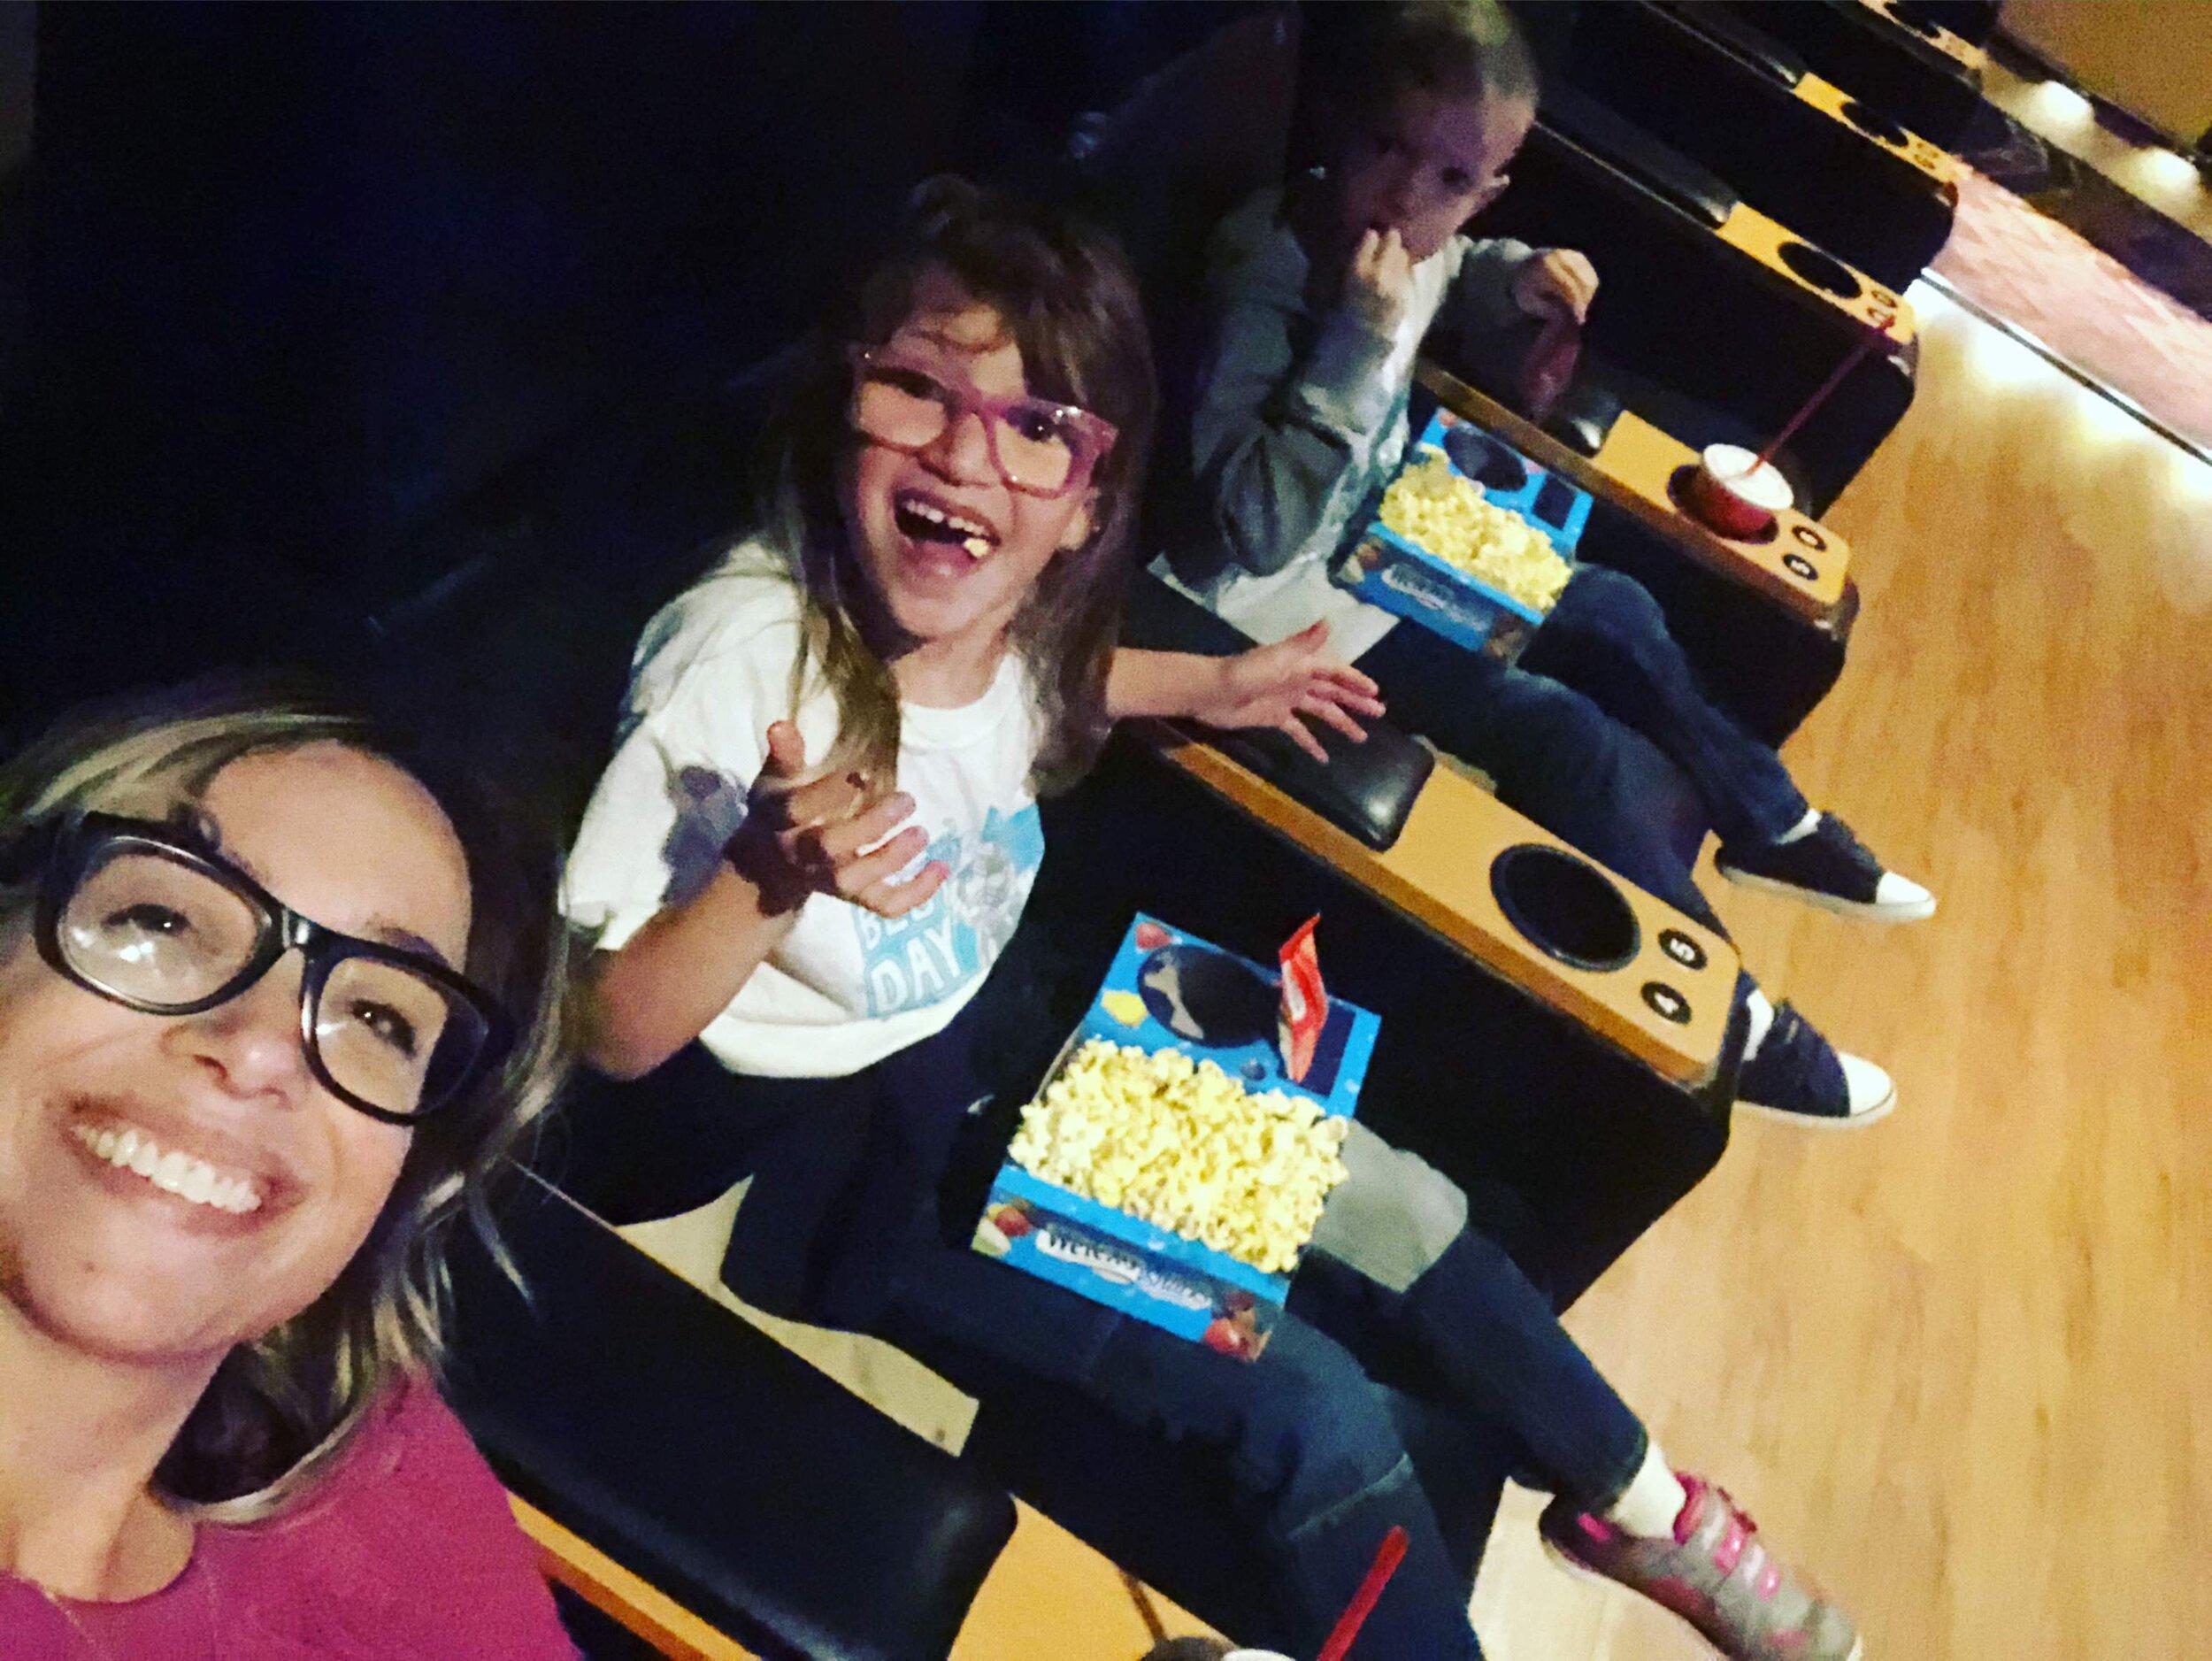 Half-day movie day